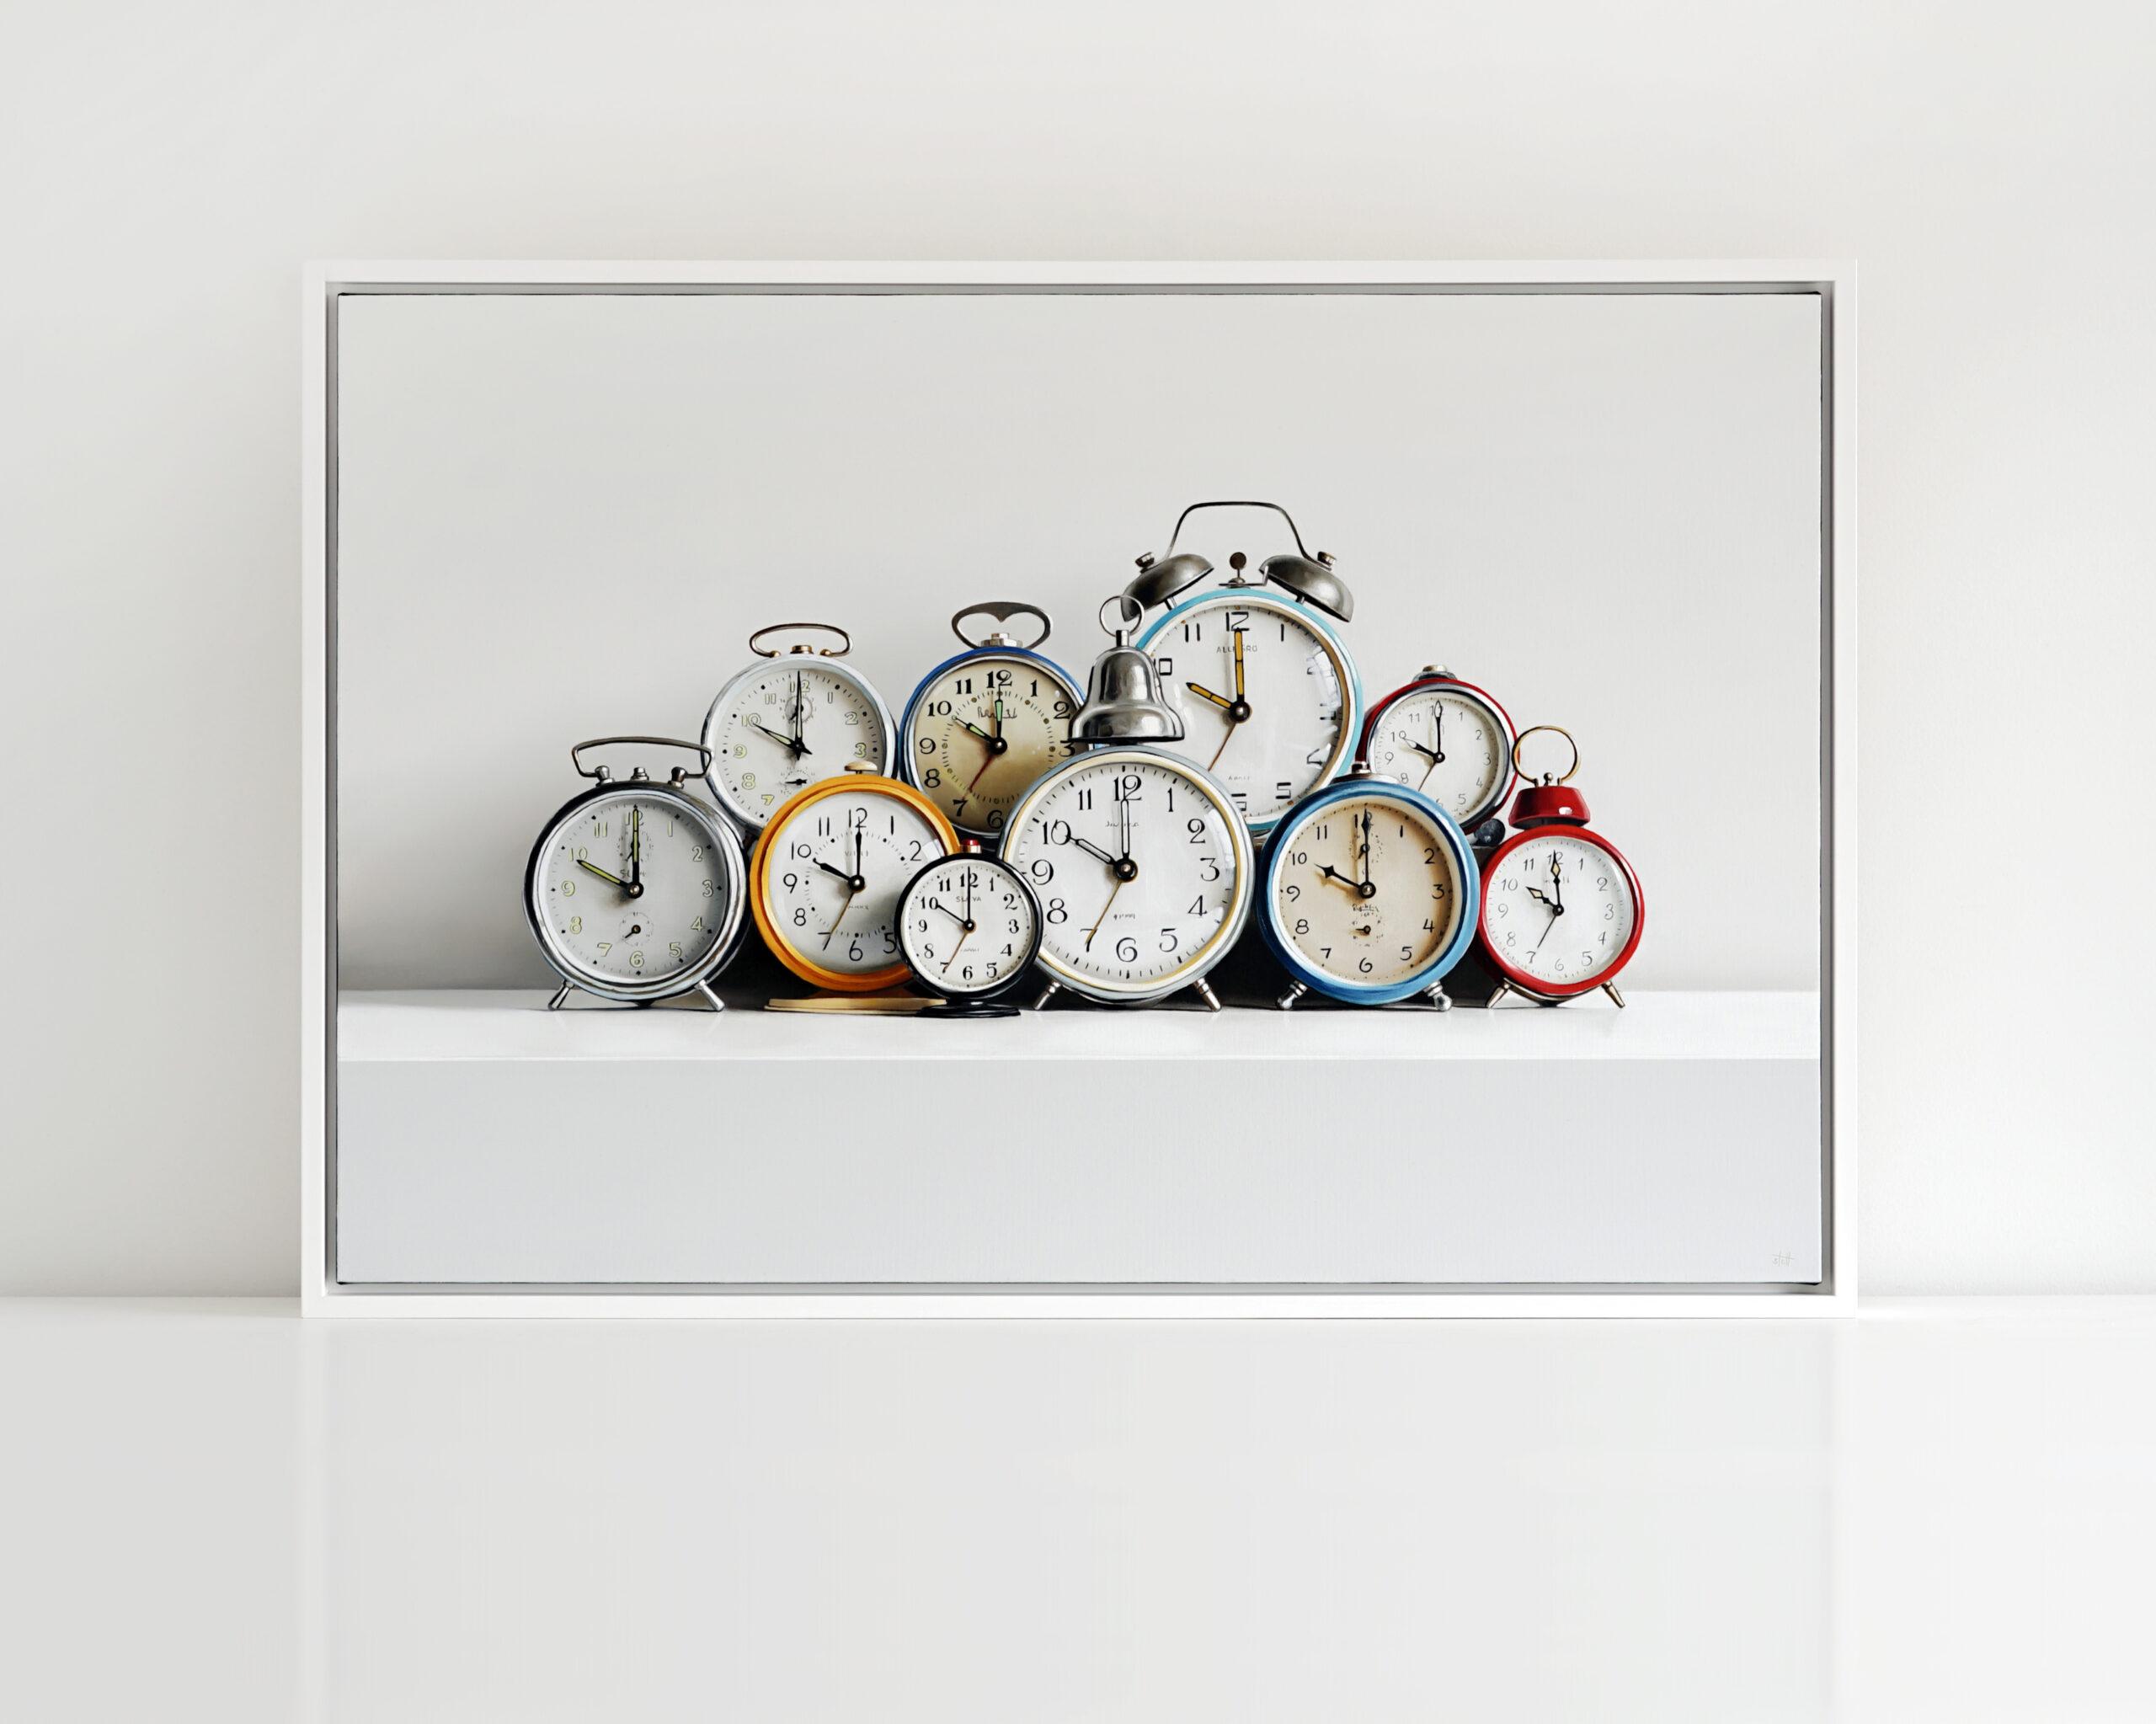 Ten Clocks Painting by Christopher Stott